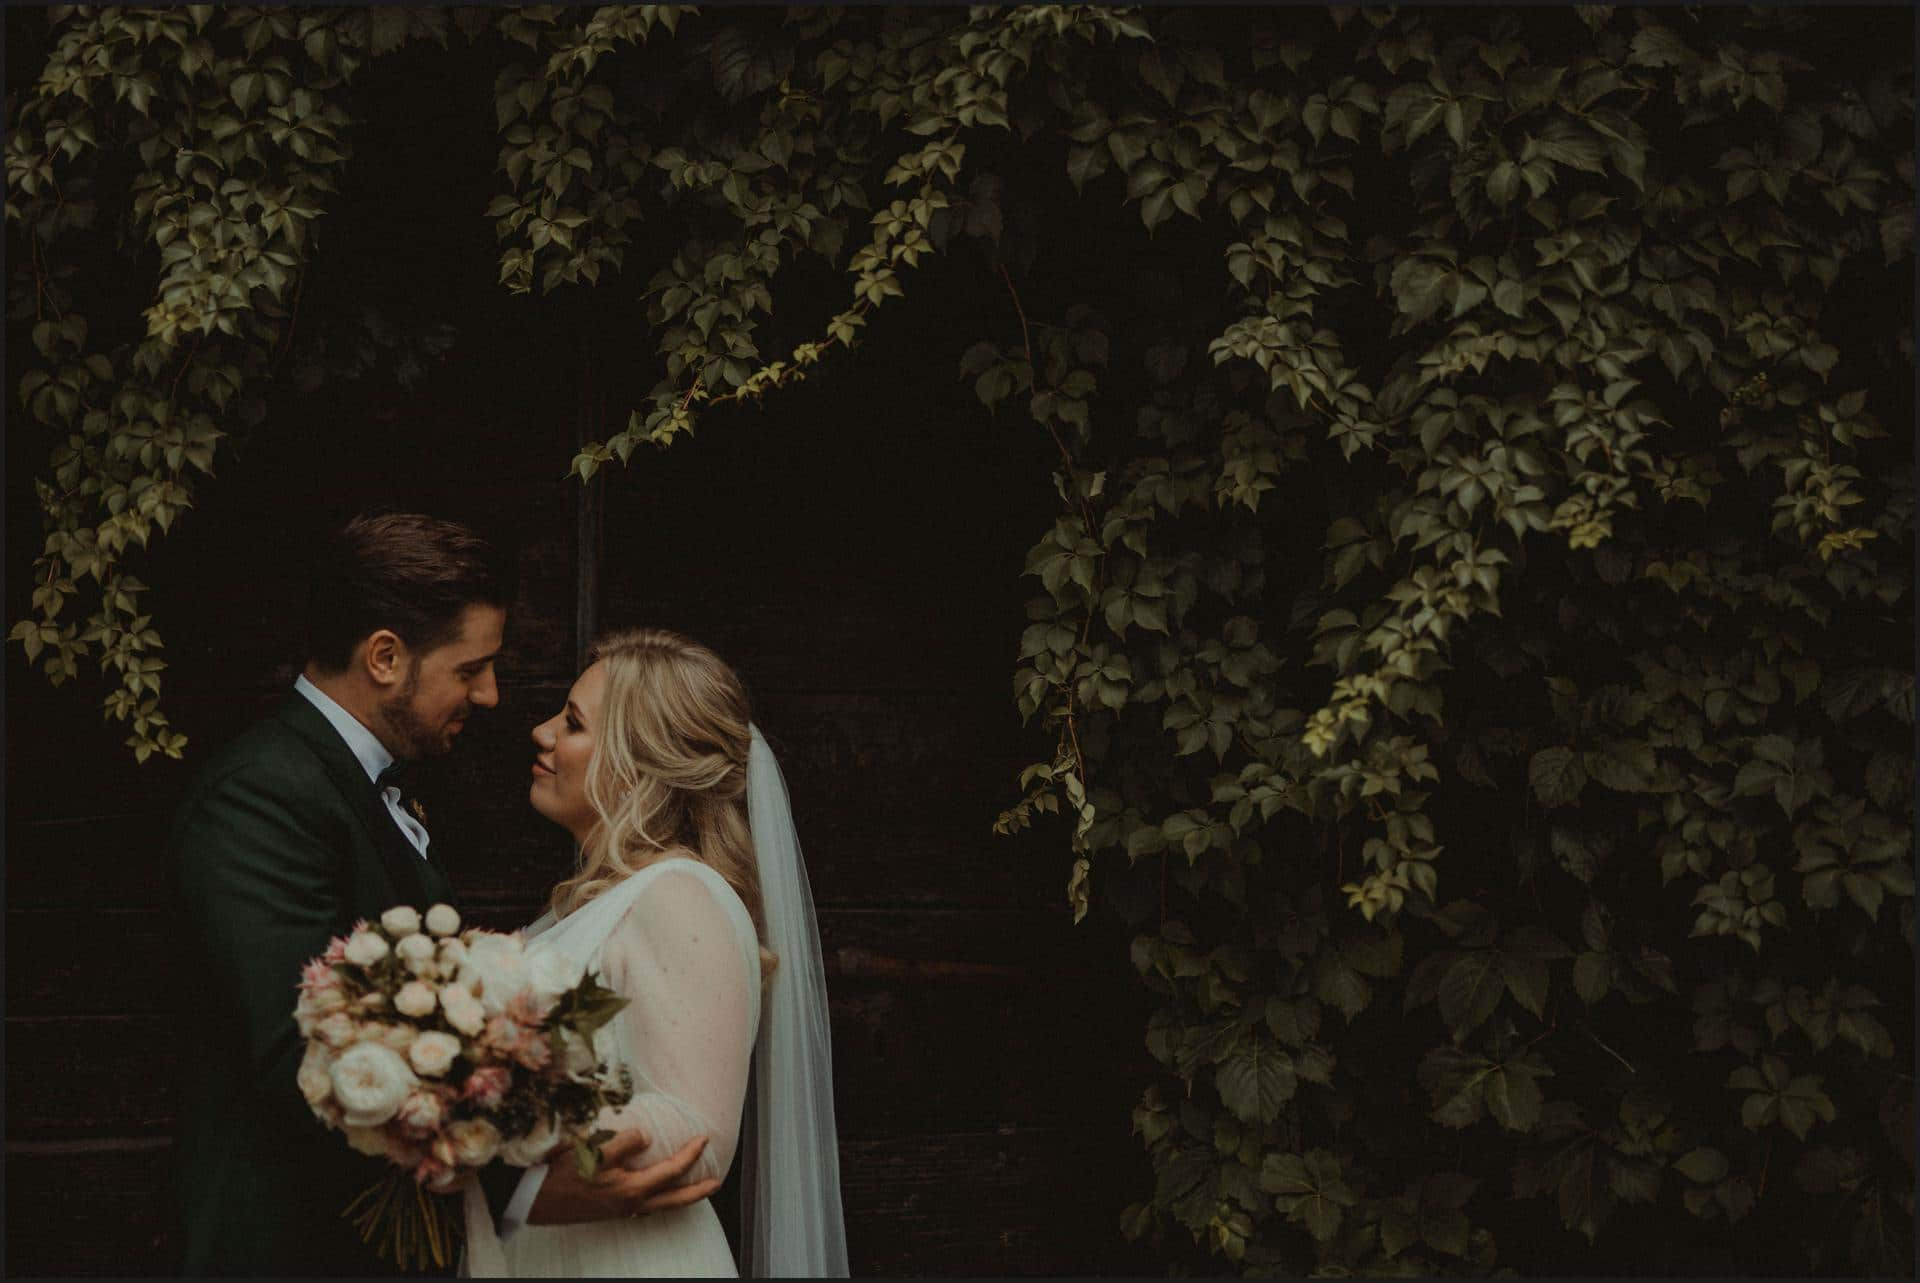 borgo di tragliata, wedding, rome, wedding in rome, bride and groom, rome wedding photographer, destination wedding